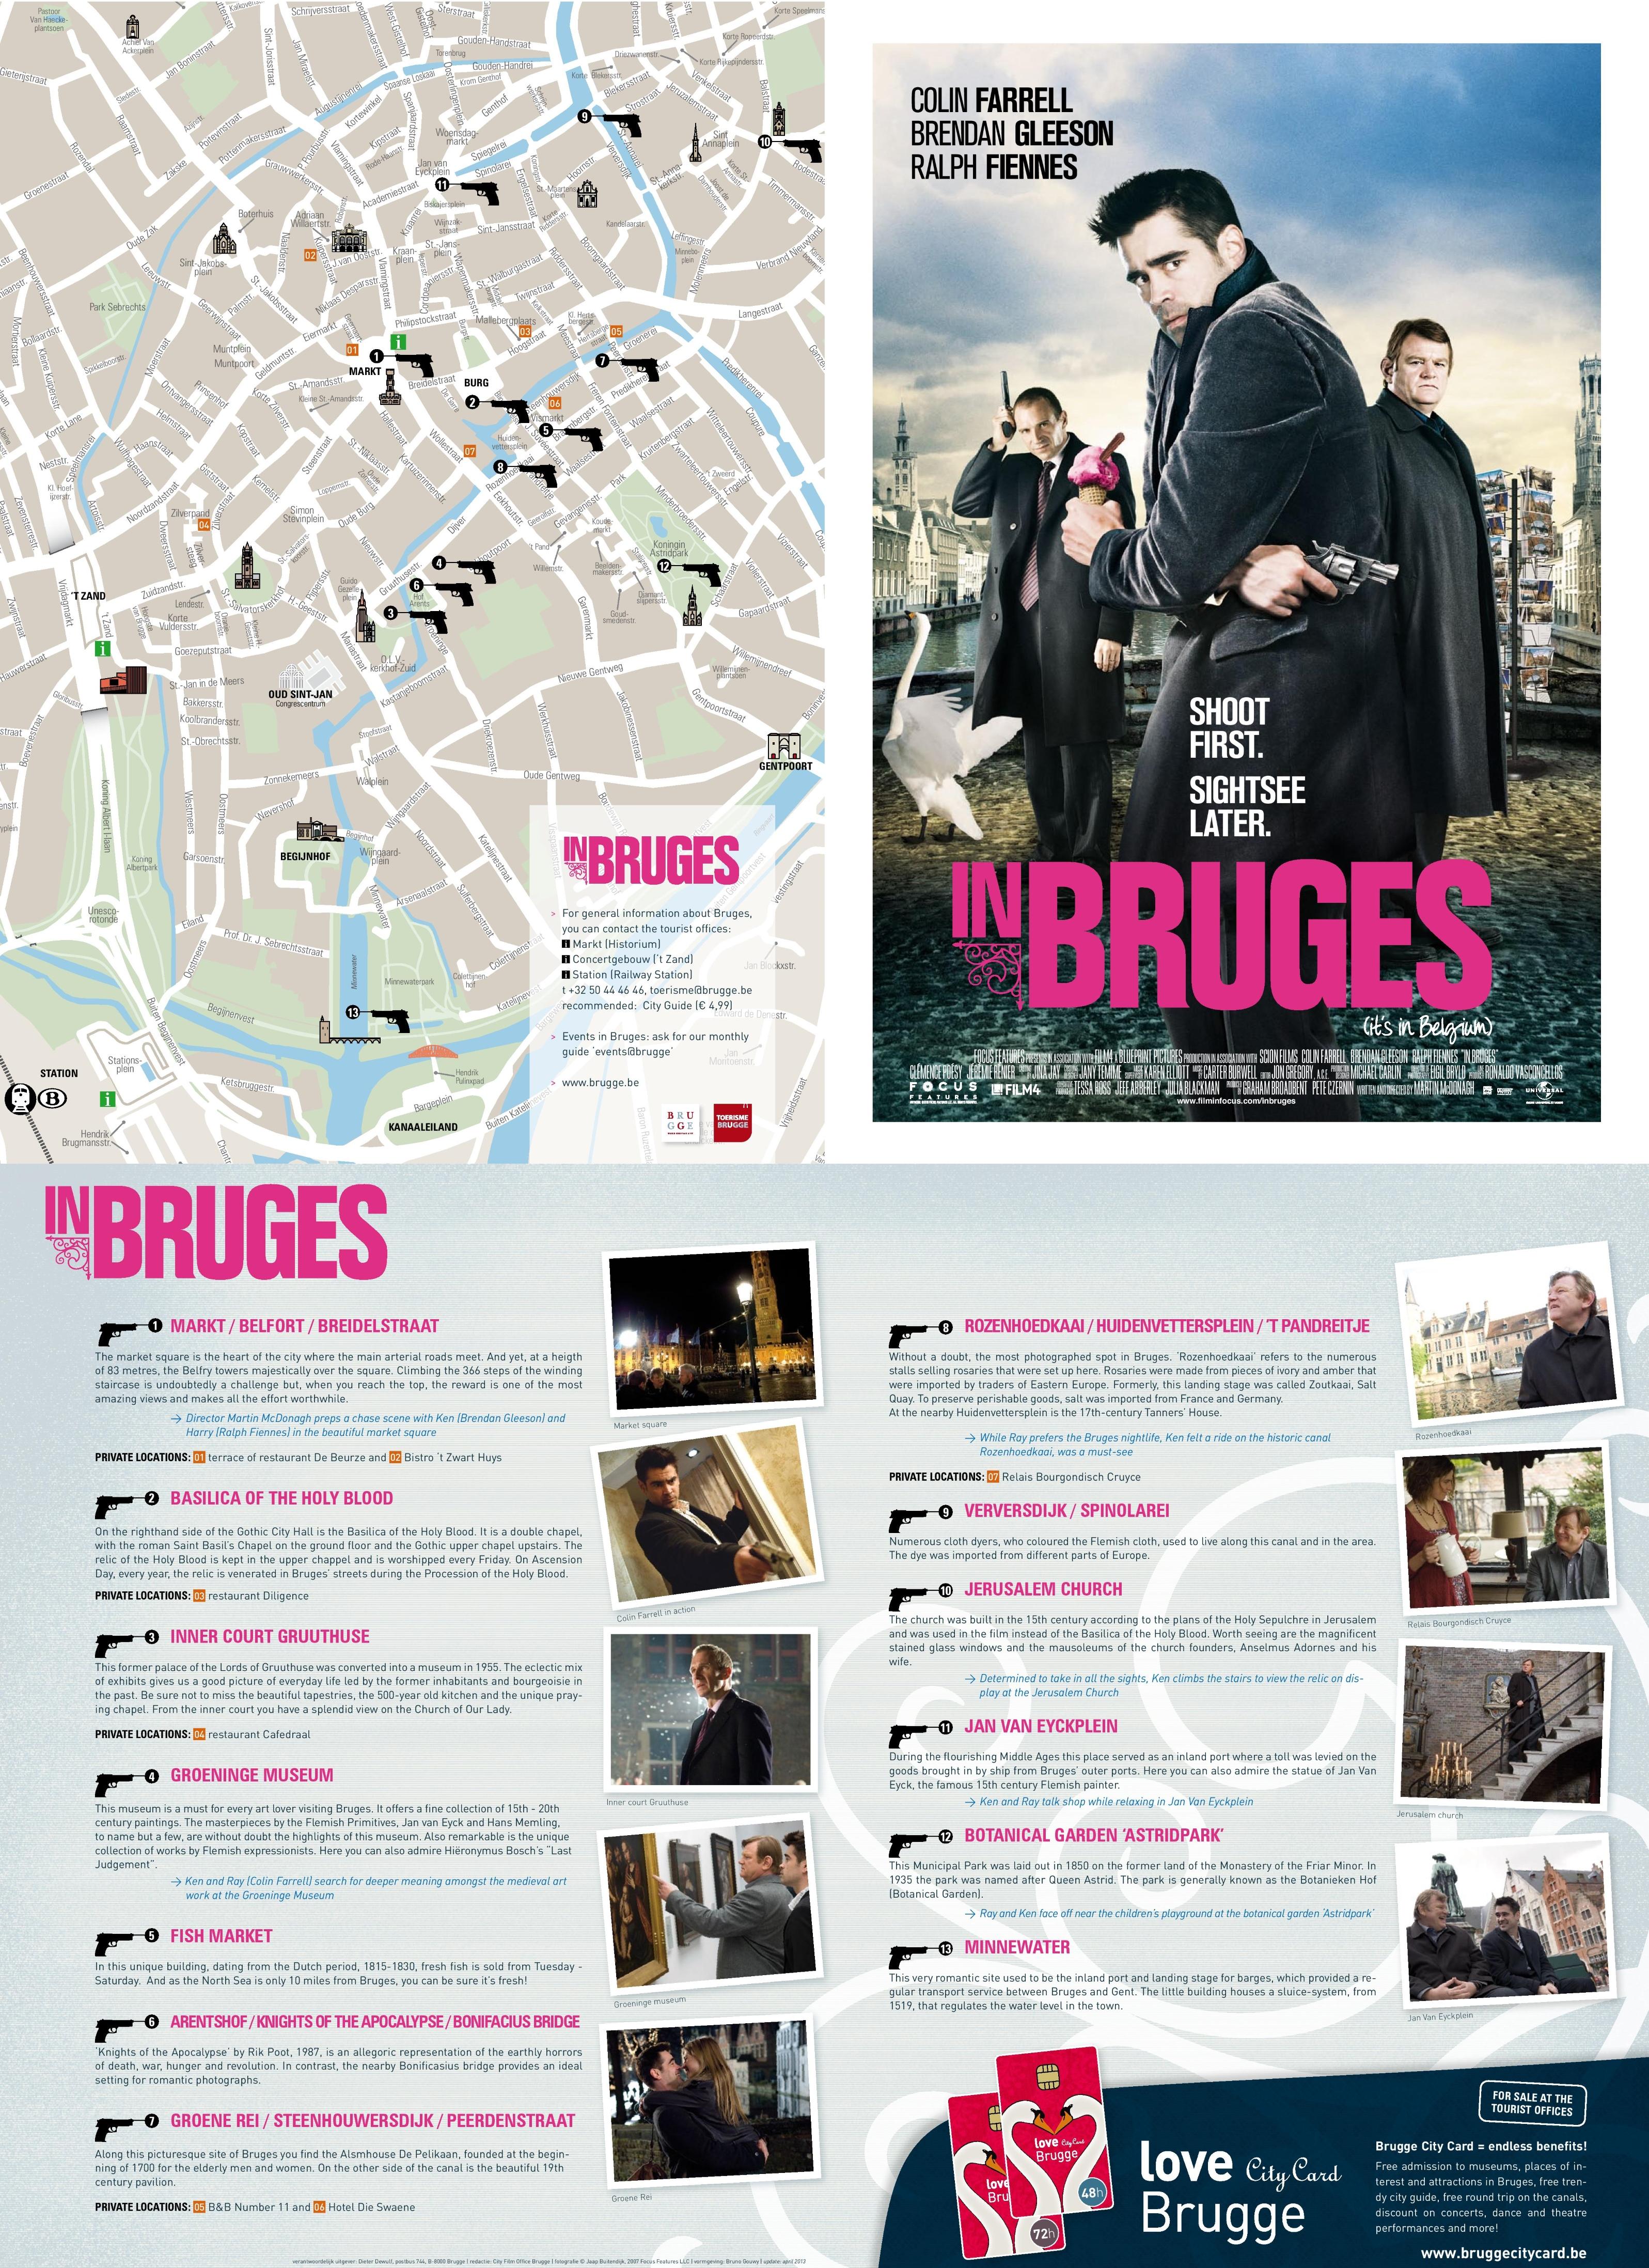 In Bruges movie map